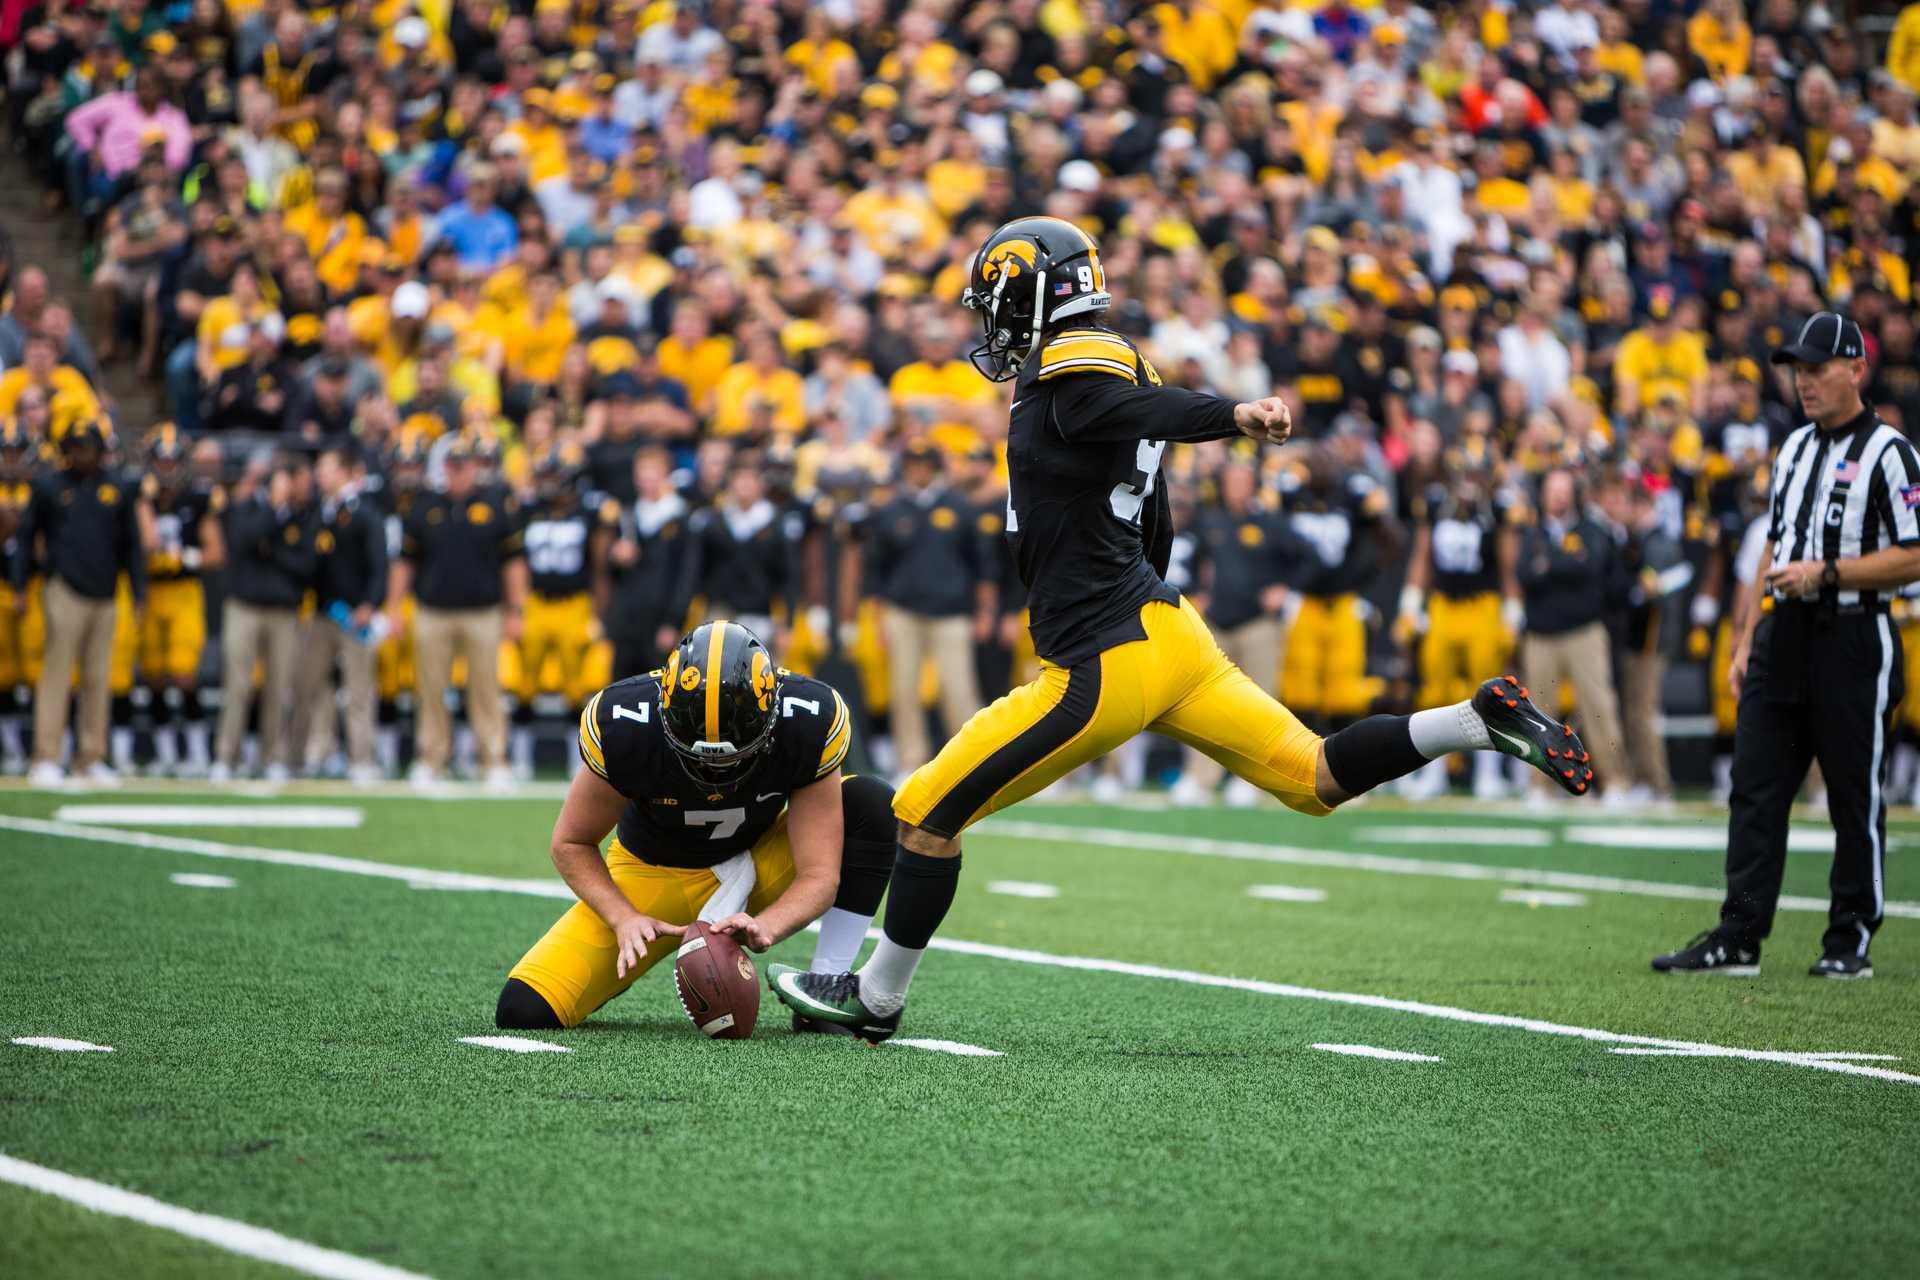 Iowa kicker Miguel Recinos kicks a field goal in the Iowa/Illinois football game on Saturday, Oct. 7, 2017. (David Harmantas/The Daily Iowan)